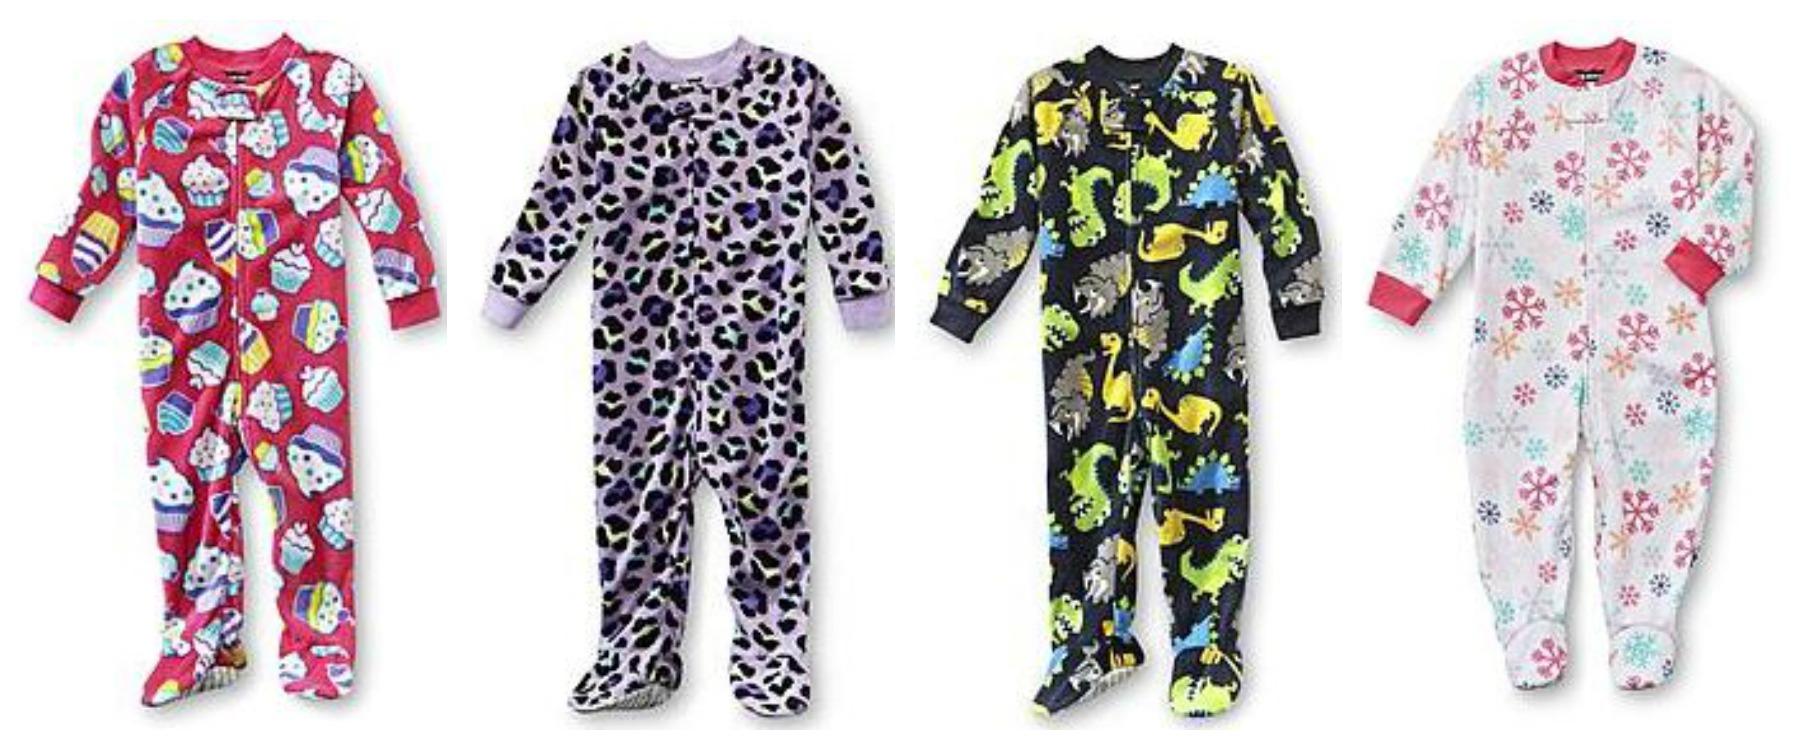 Kmart.com Pajamas